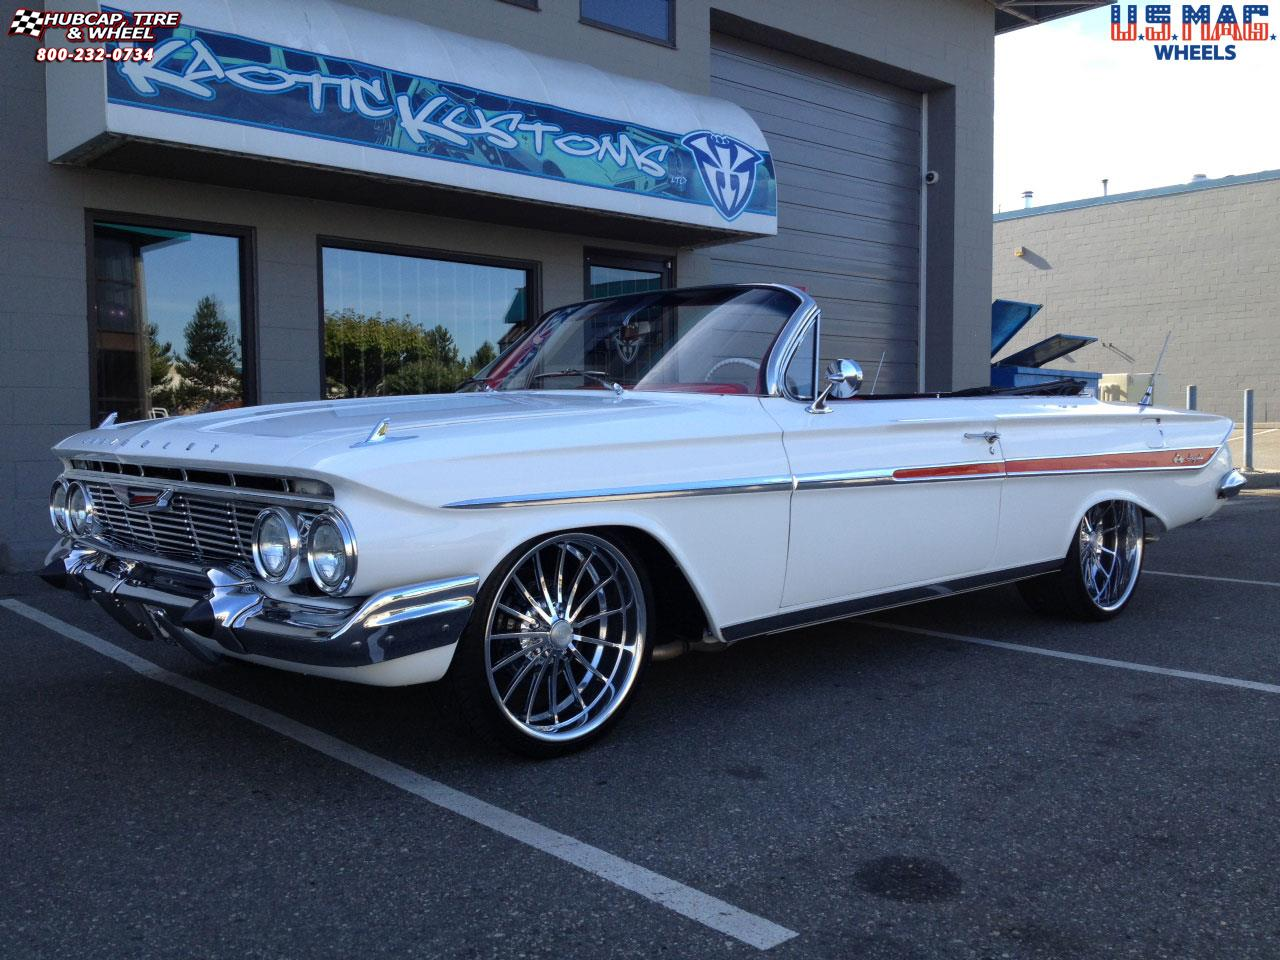 chevrolet impala us mags heritage u427 wheels polished. Black Bedroom Furniture Sets. Home Design Ideas